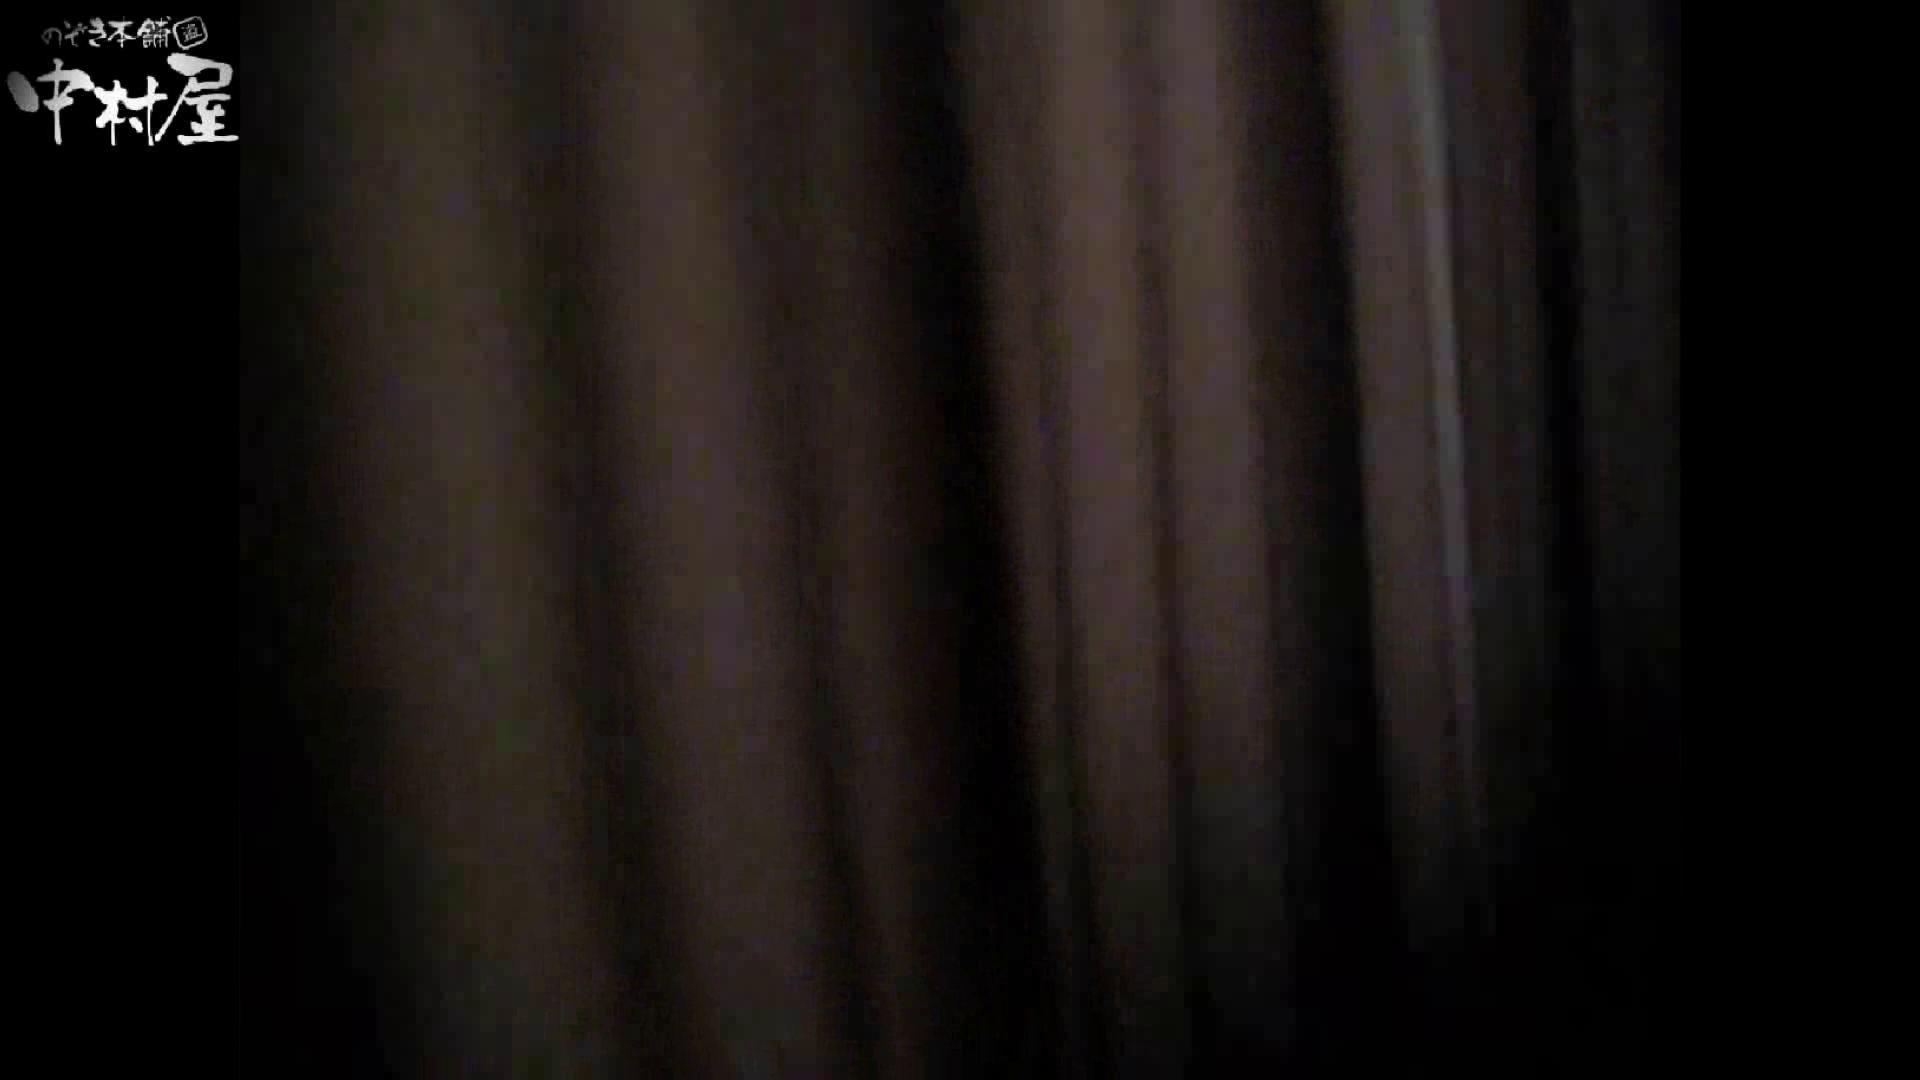 民家風呂専門盗撮師の超危険映像 vol.020 盗撮シリーズ オマンコ無修正動画無料 93PIX 22